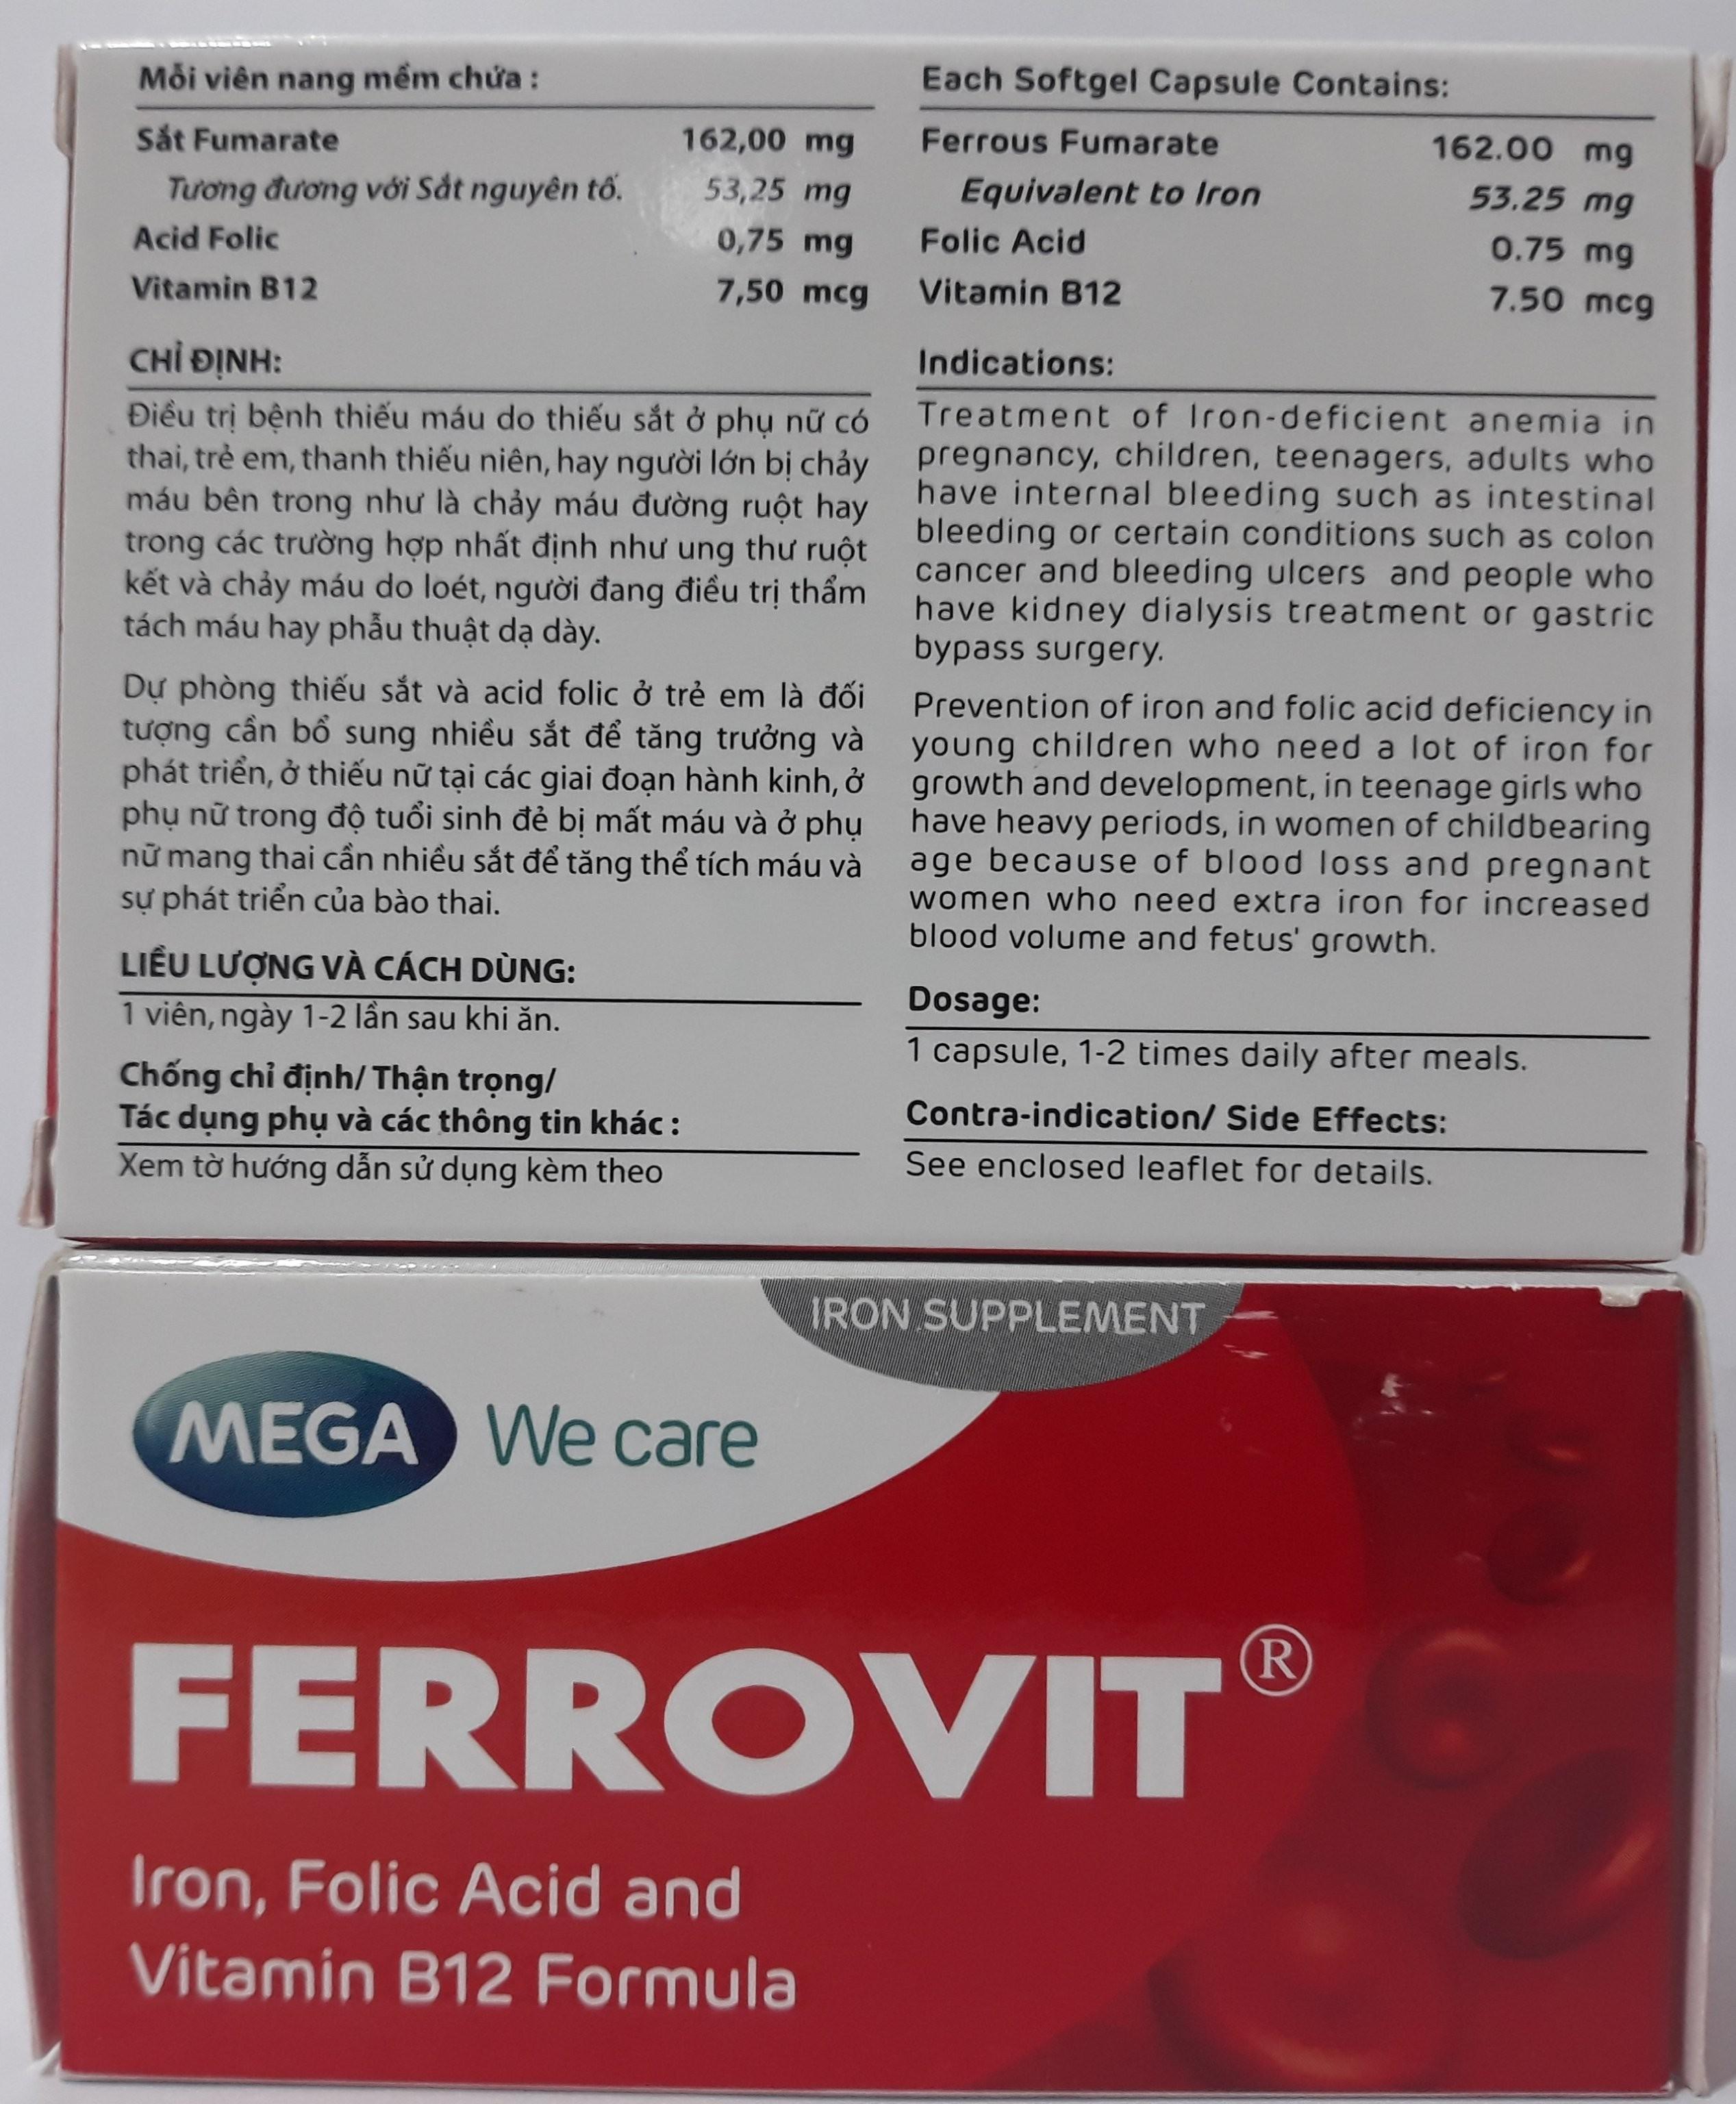 thuốc bổ máu ferrovit, bổ máu, thuốc bổ máu, ferrovit, thuốc sắt ferrovit